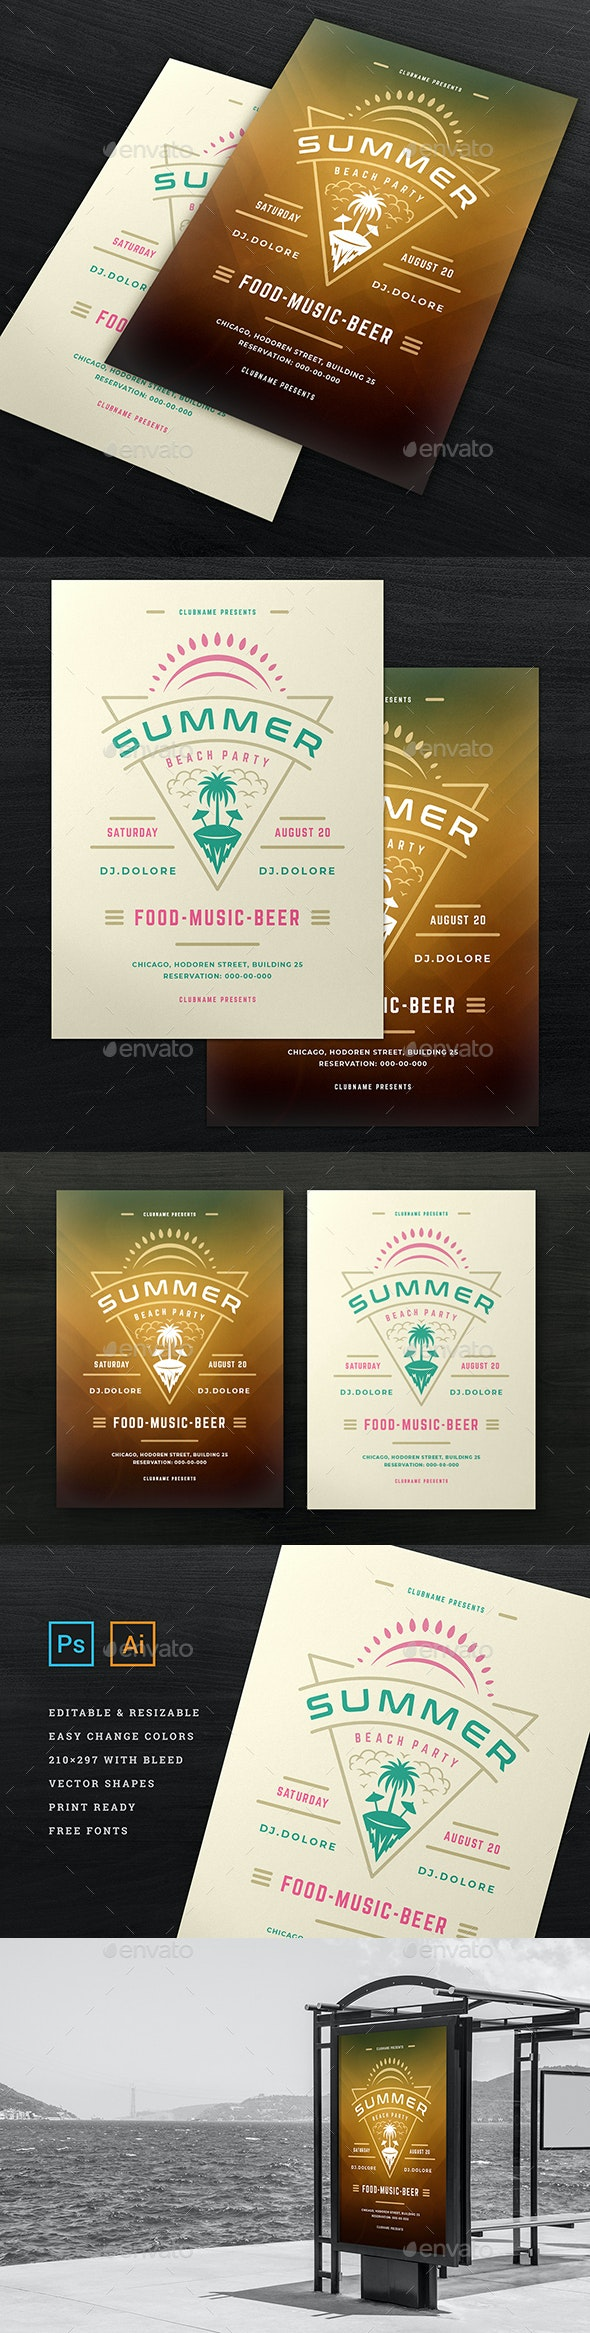 Summer Beach Party Flyer Template - Flyers Print Templates